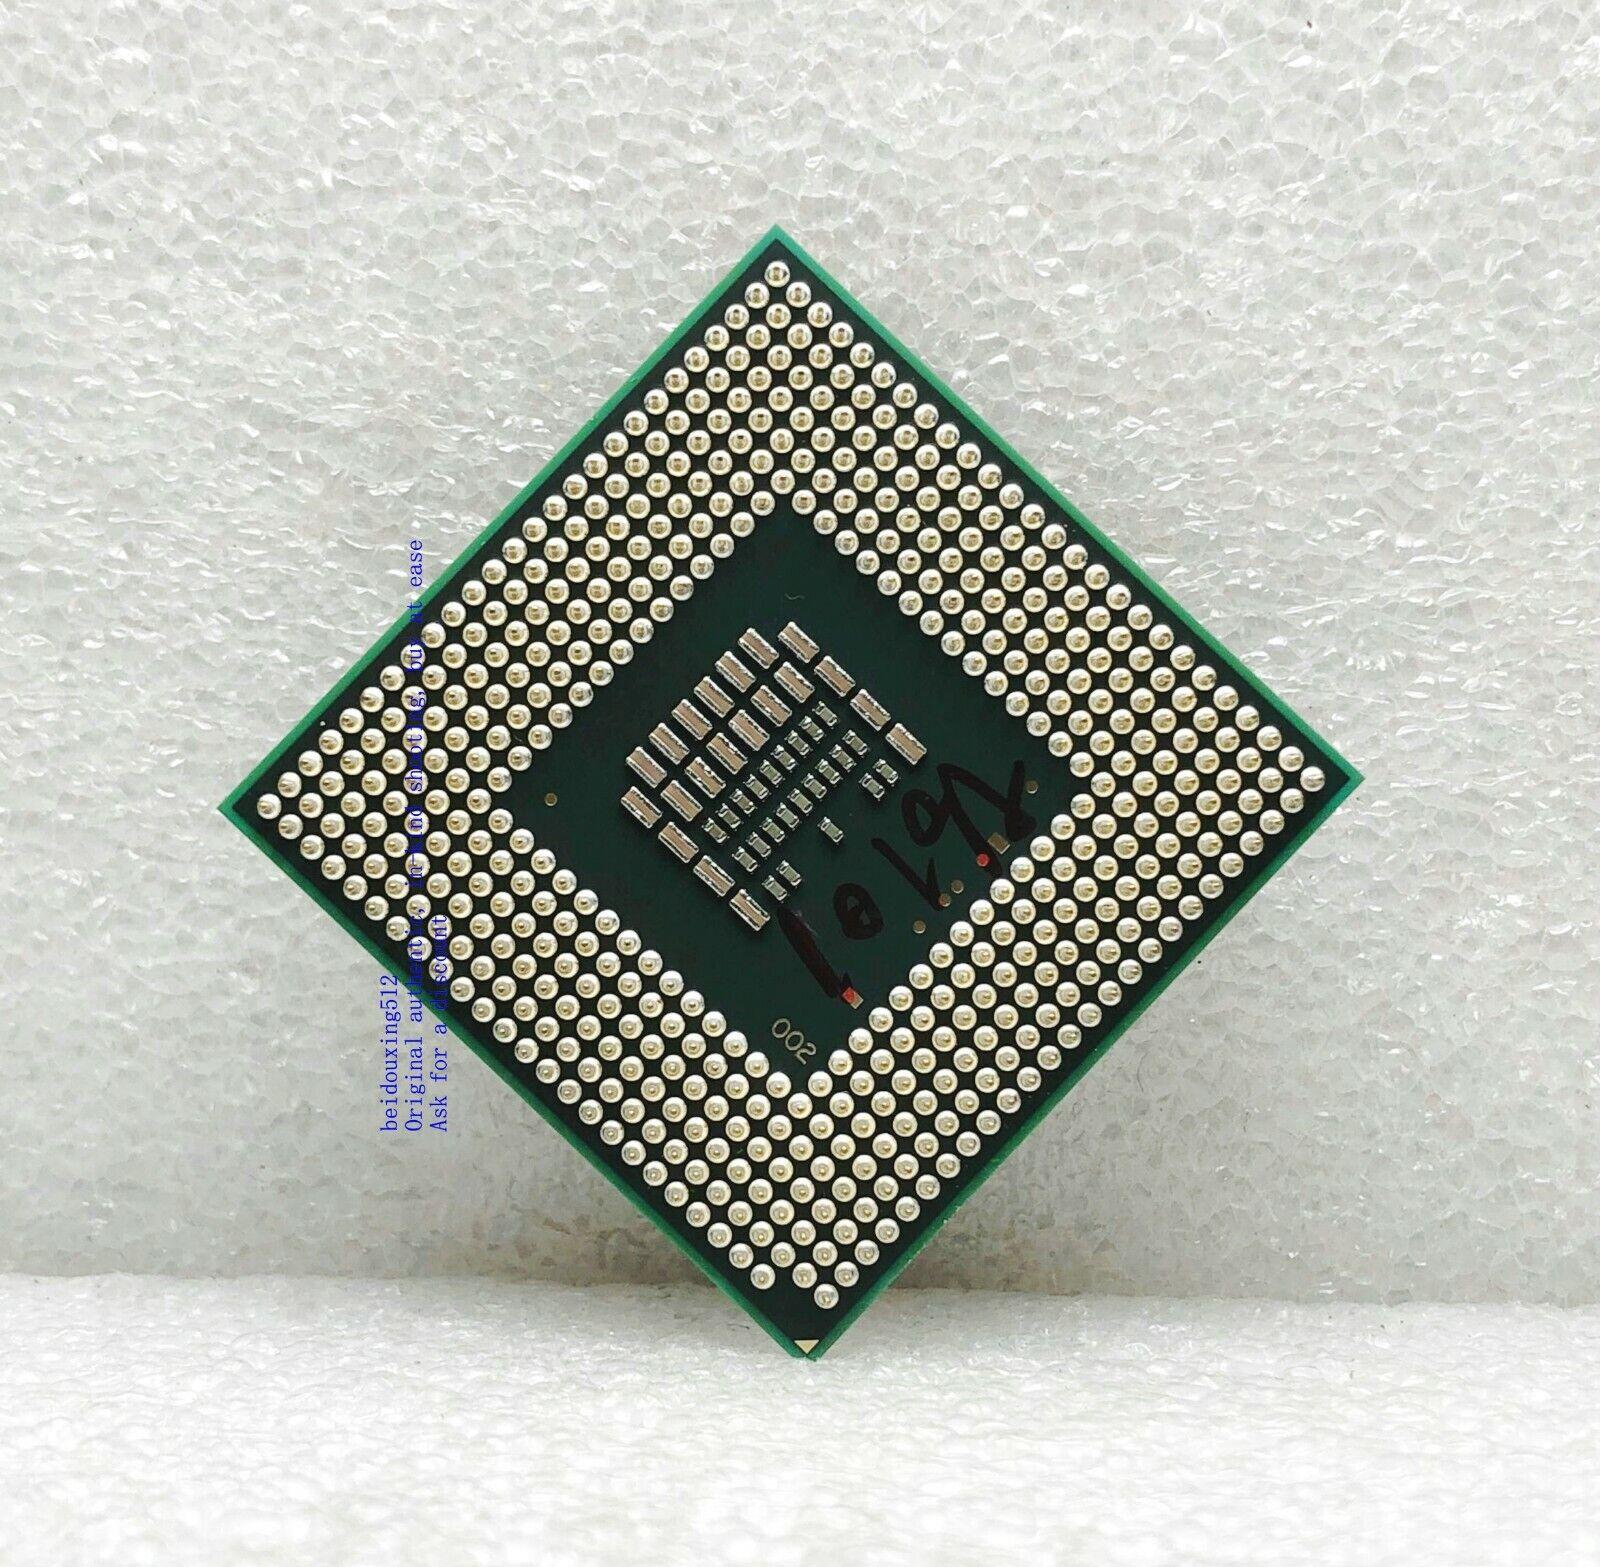 Intel Core 2 Duo T7300 SLA45 SLAMD 2.0 GHz Dual-Core Dual-Thread CPU Processor 4M 35W Socket P